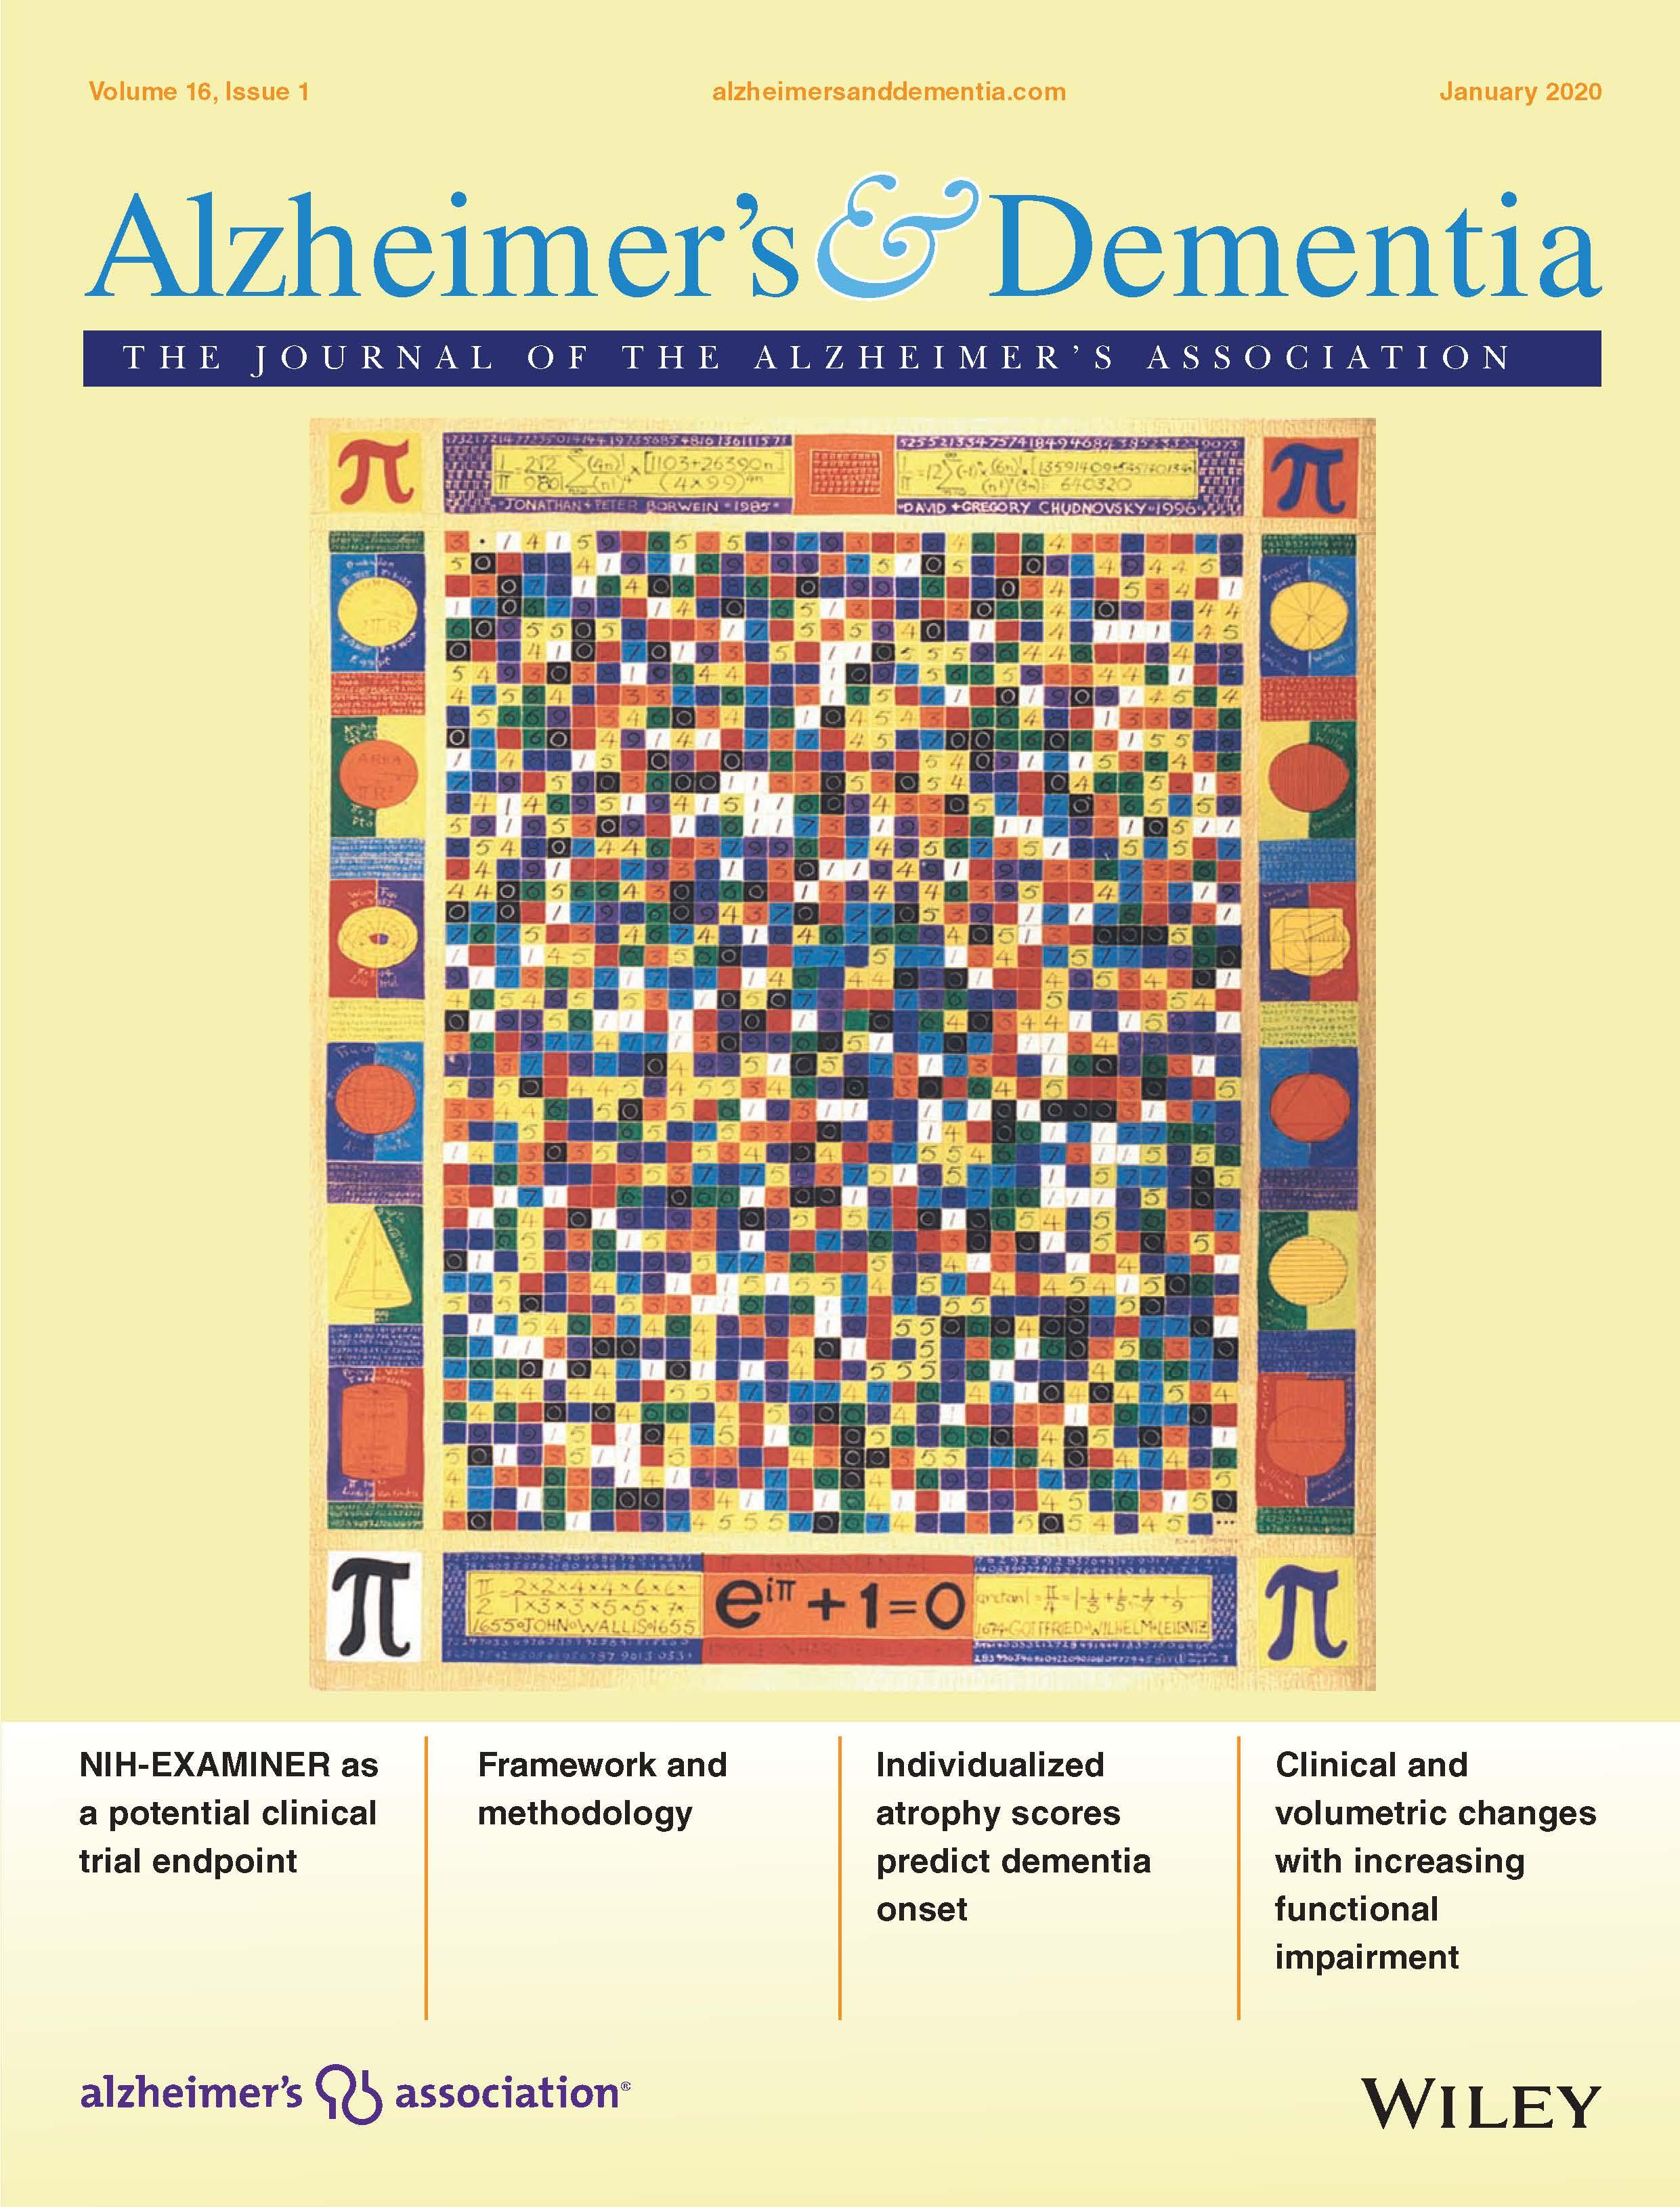 Alzheimer's & Dementia: The Journal of the Alzheimer's Association January 2020 Issue